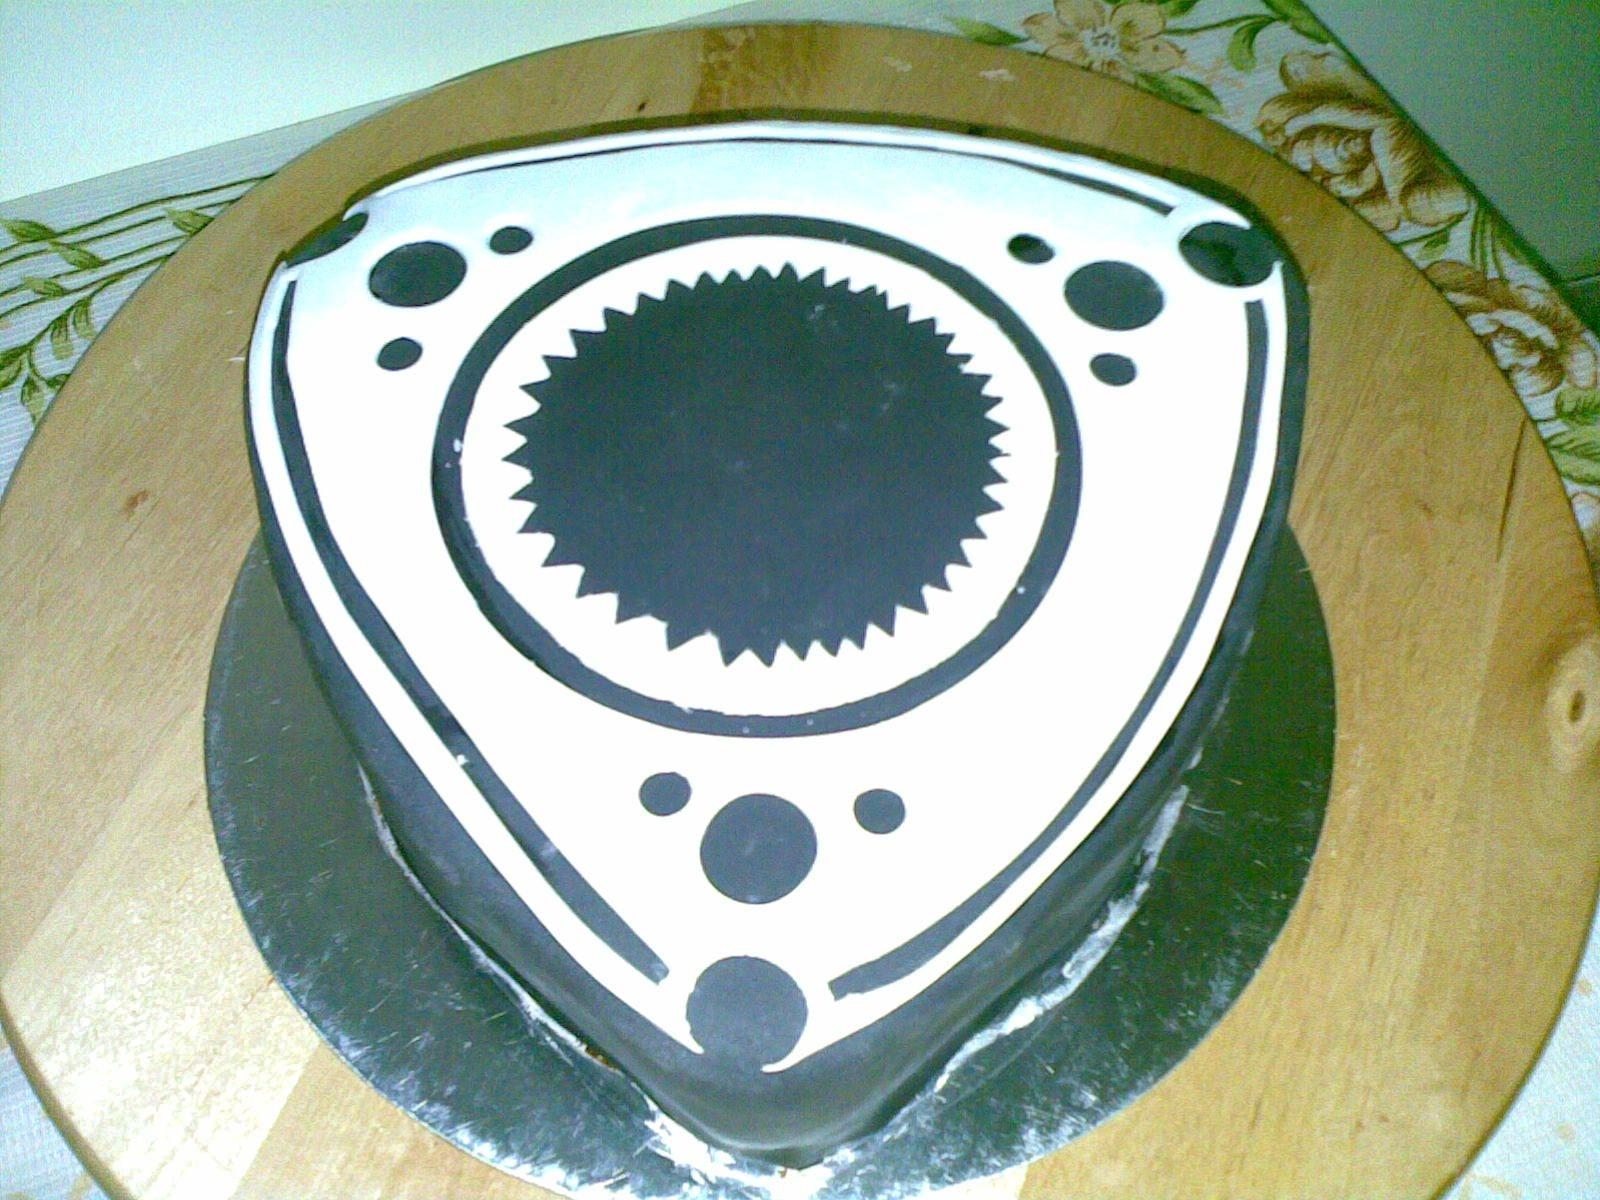 Mazda rx7 on rotary symbol cake cake gallery on cake central mazda rx7 on rotary symbol cake biocorpaavc Choice Image